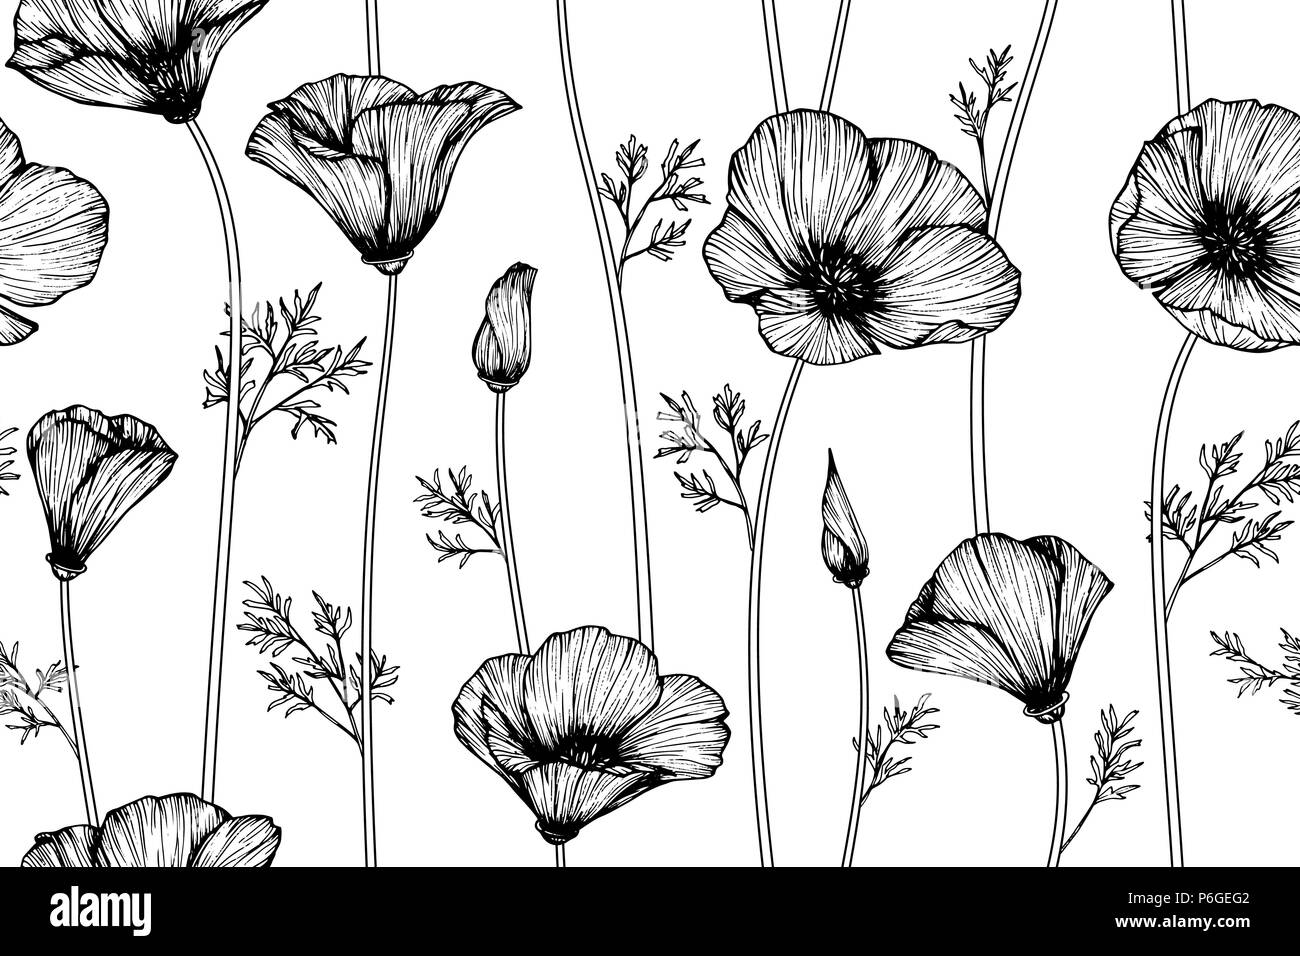 Seamless california poppy flower pattern background black and white seamless california poppy flower pattern background black and white with drawing line art illustration mightylinksfo